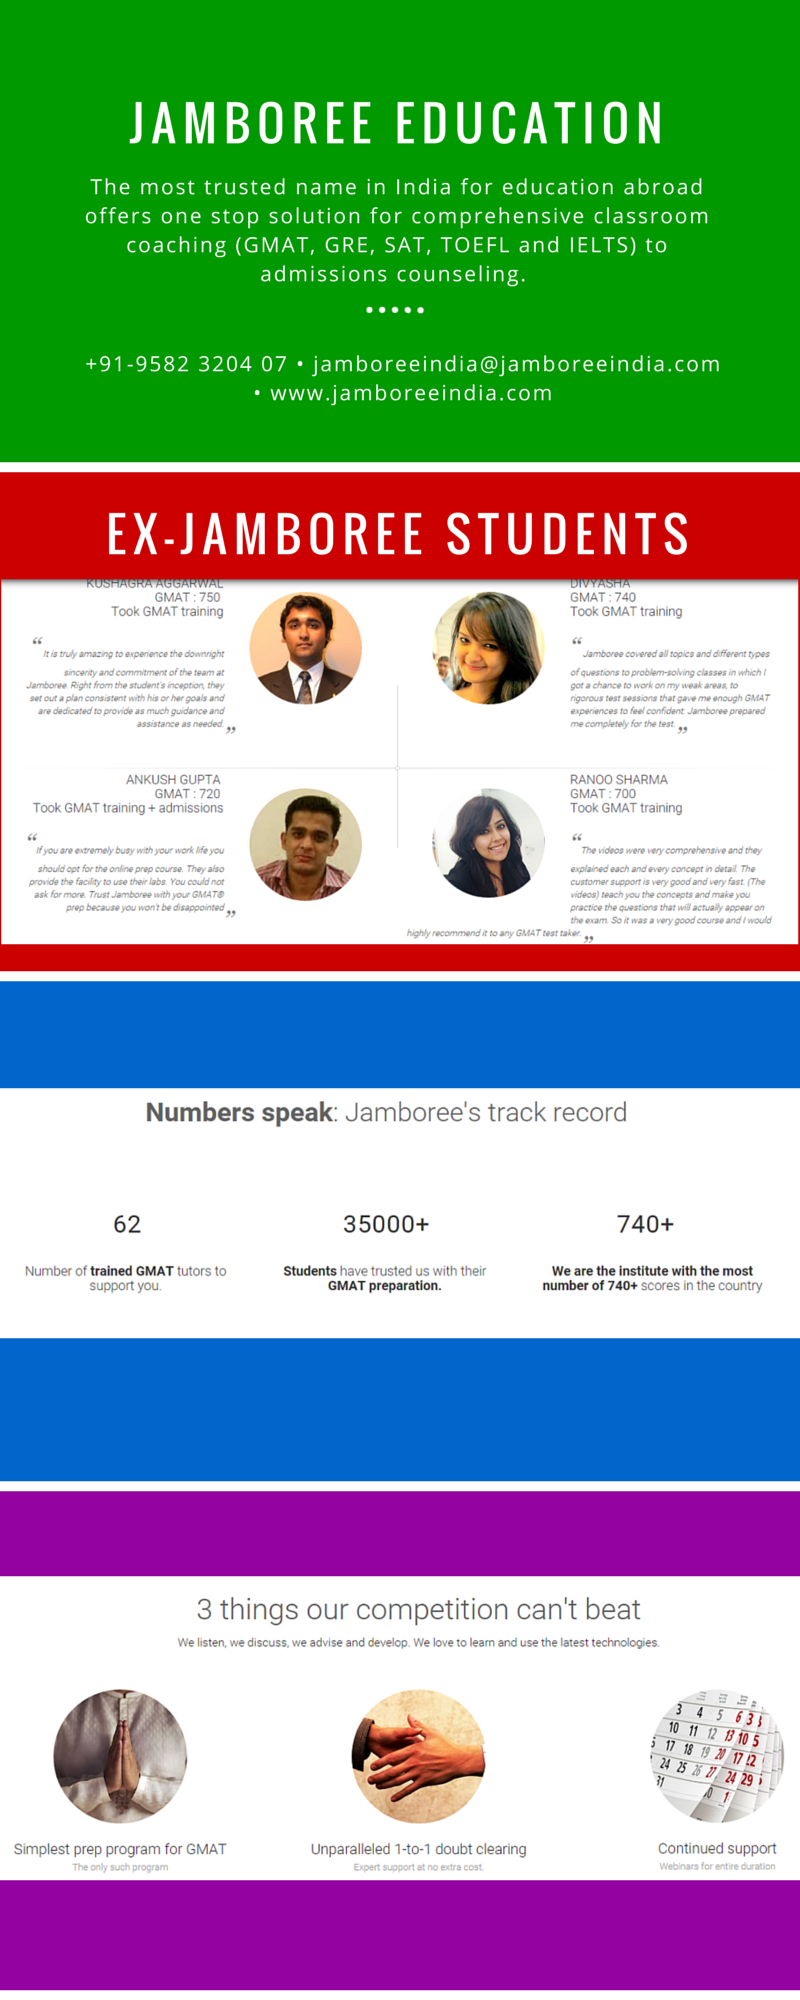 Numbers speak Jamboree's track record - Jamboree GMAT Reviews